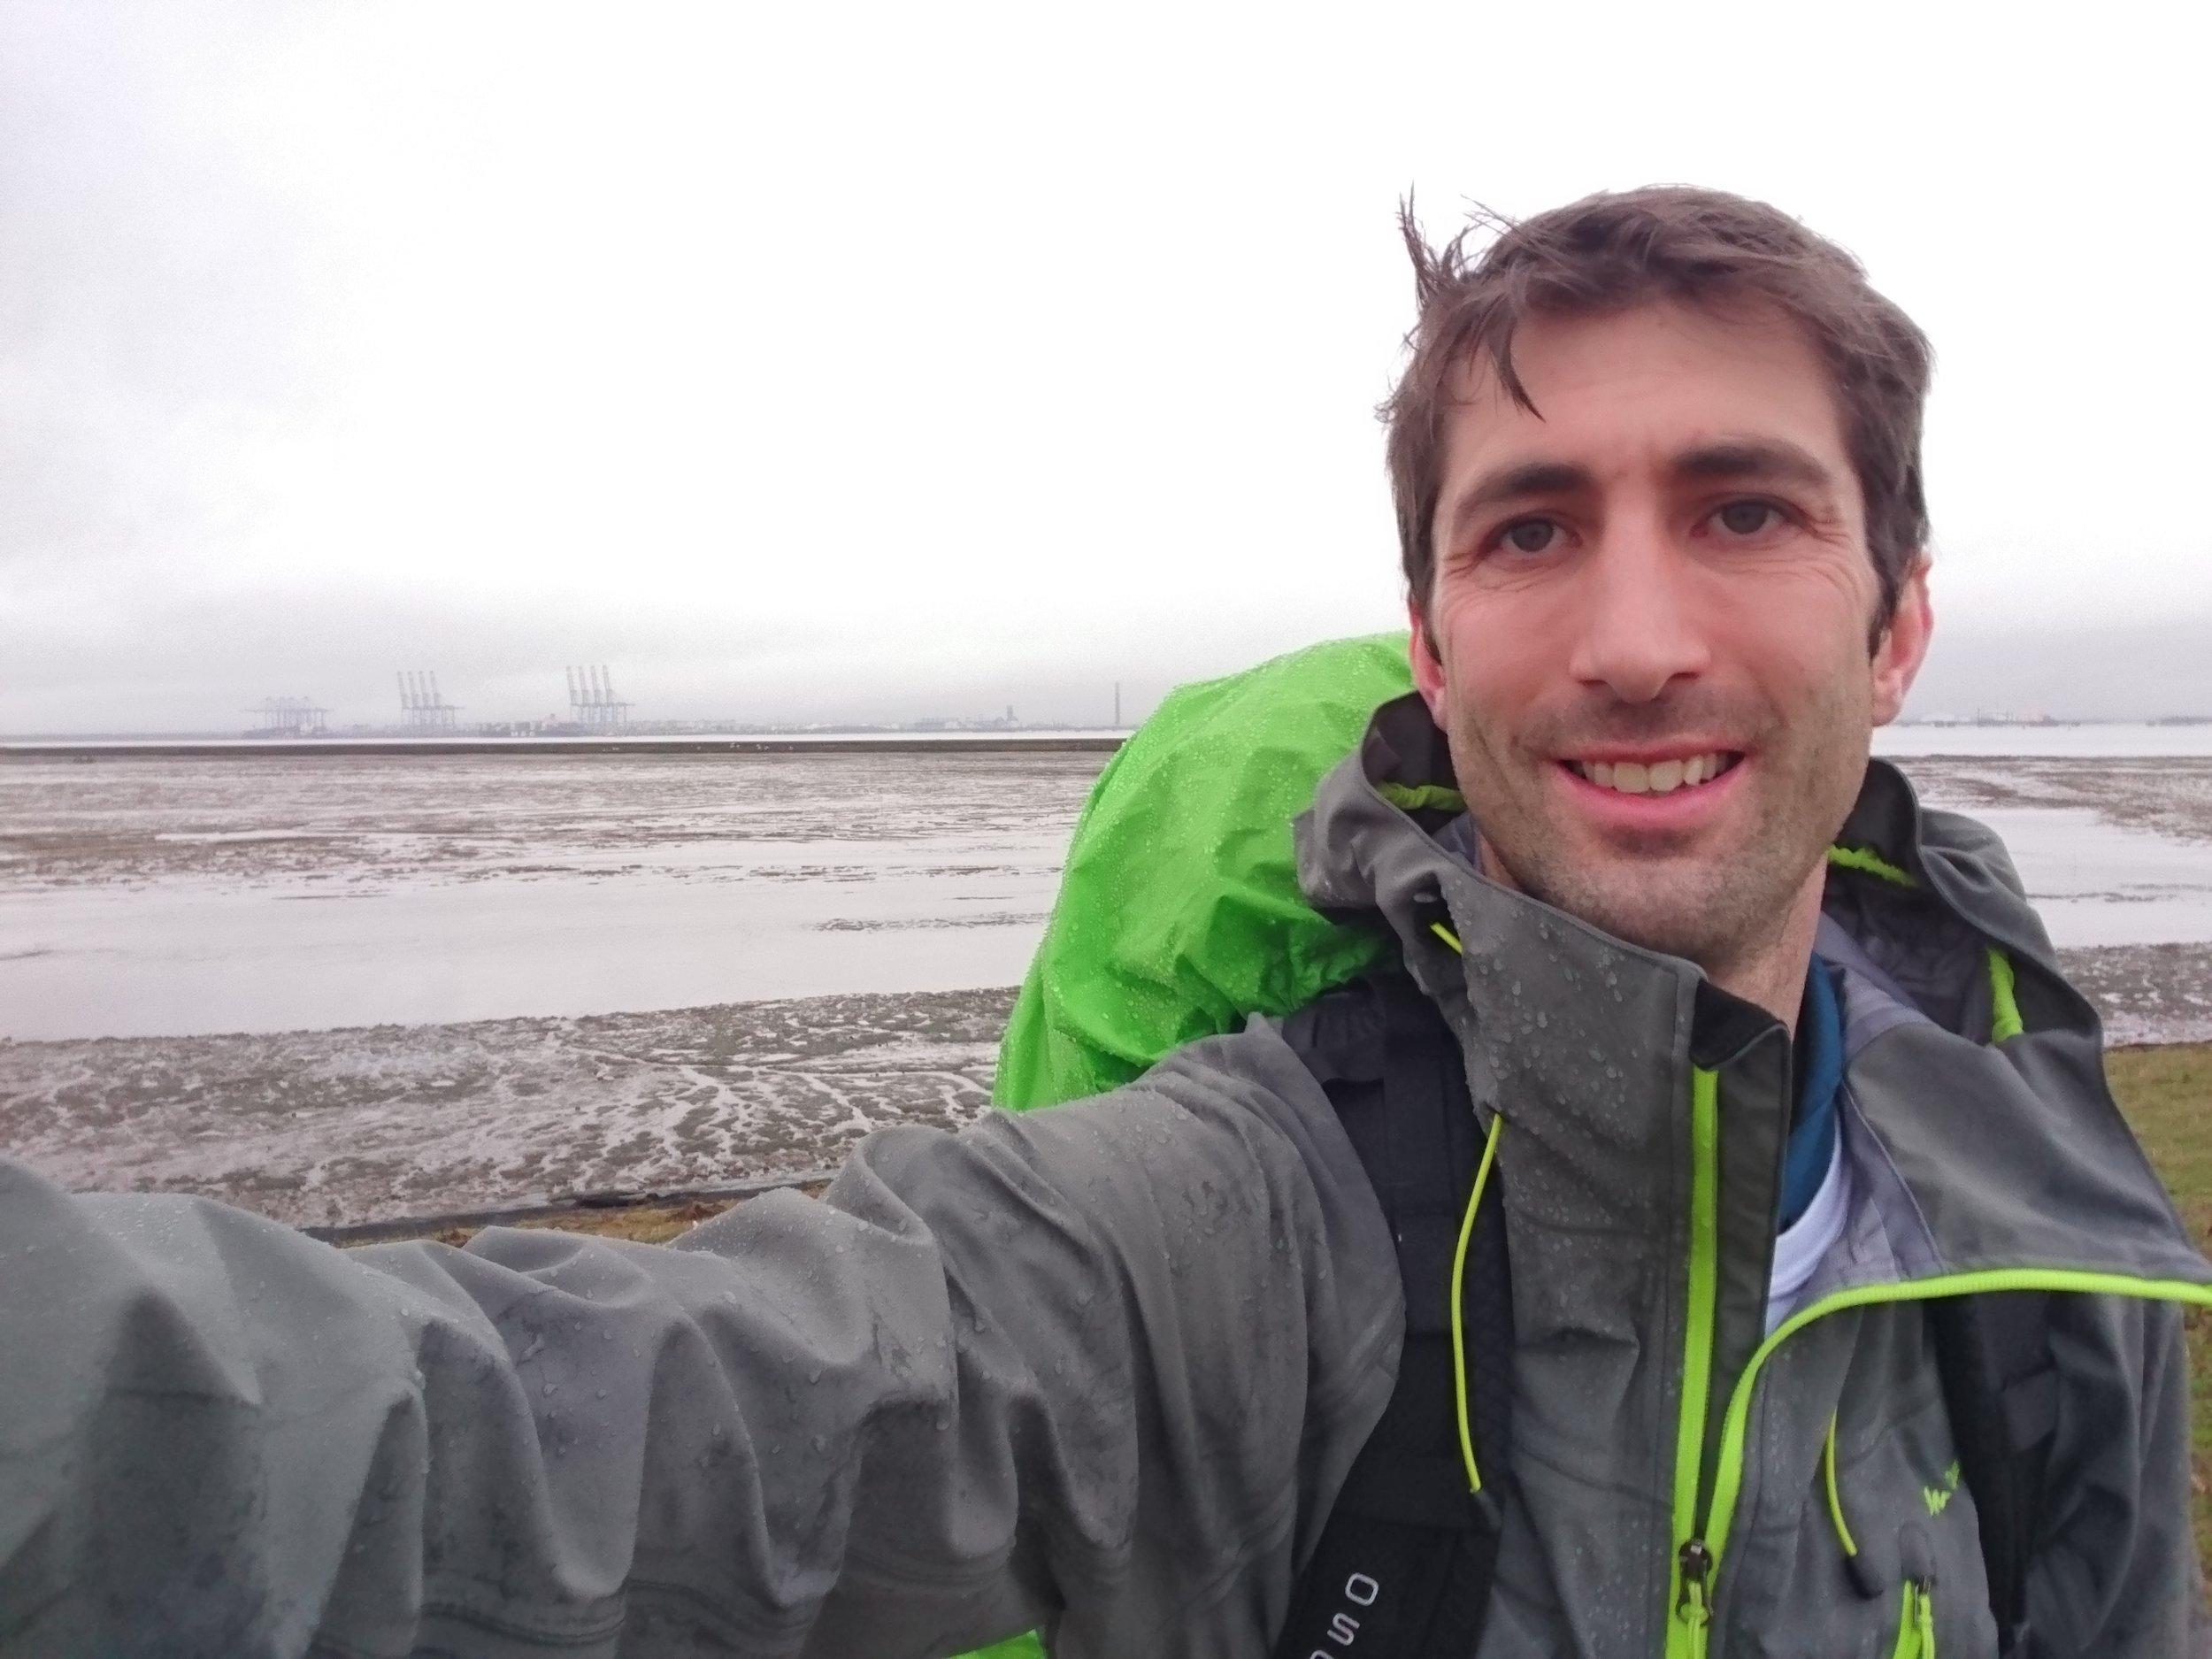 Stopped raining selfie time